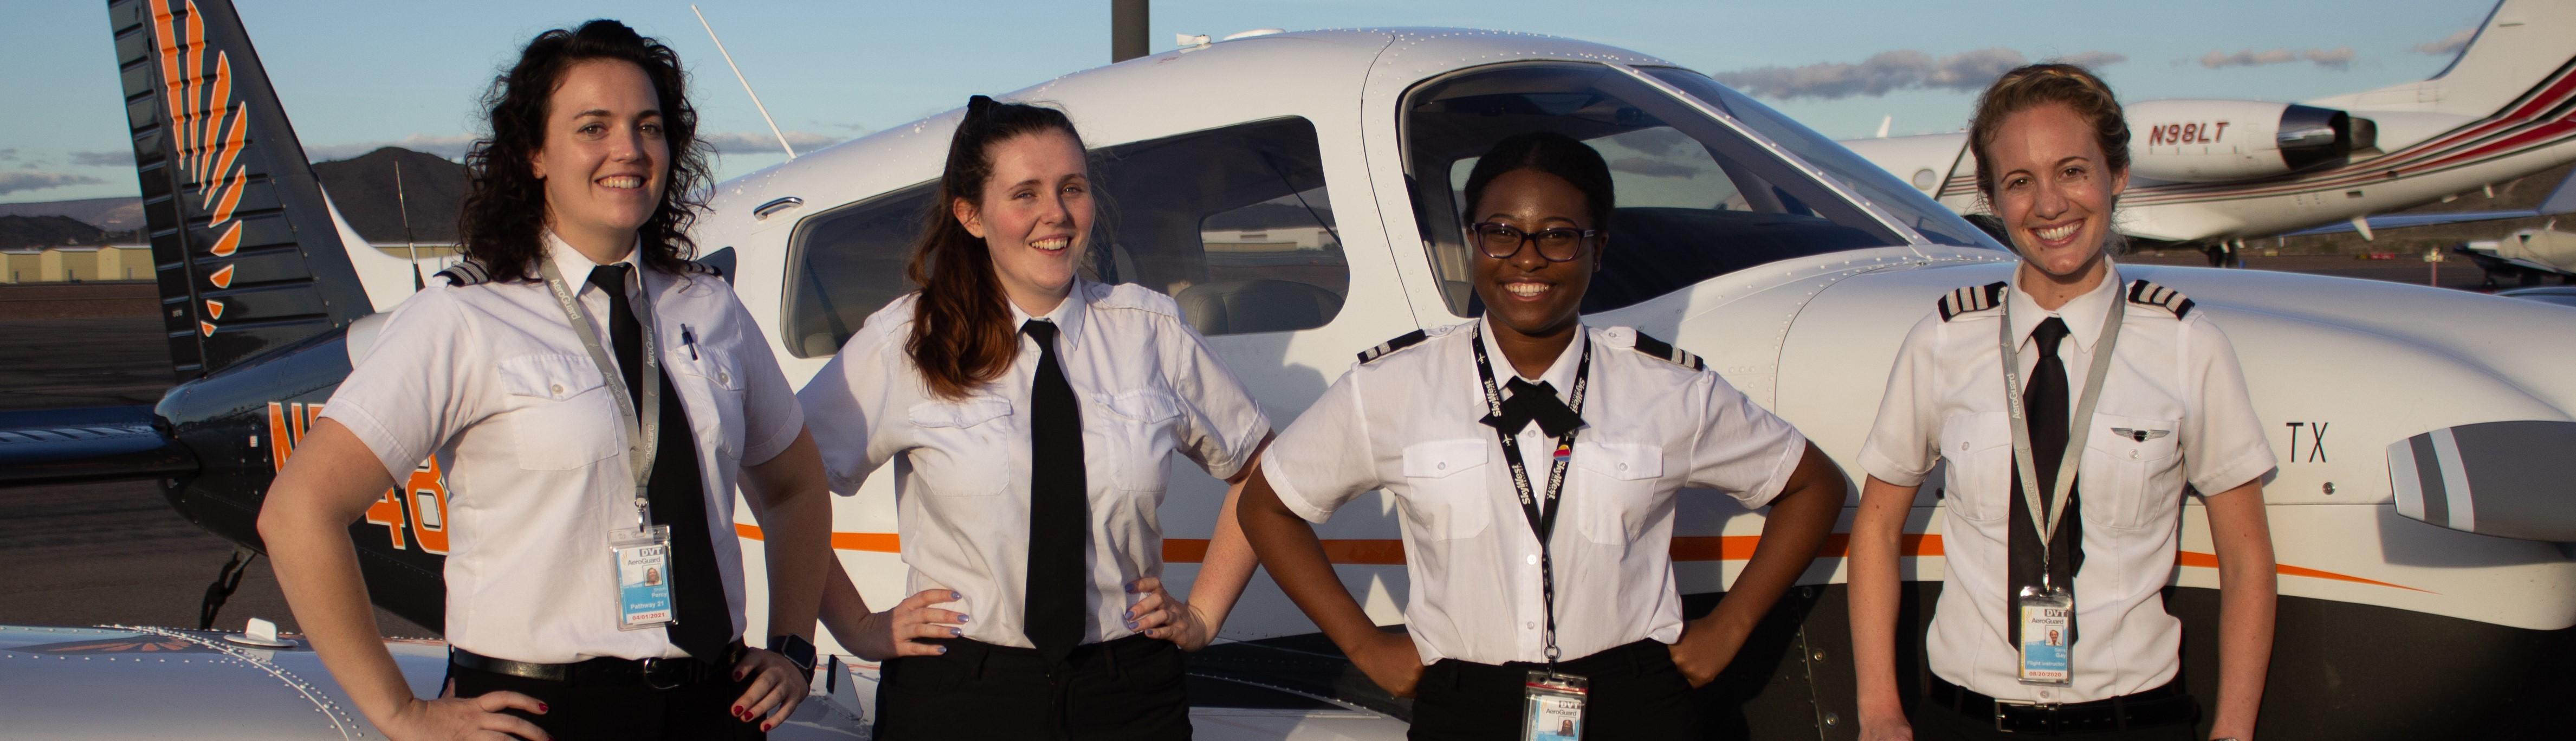 Hölgykadétok - Aeroguard